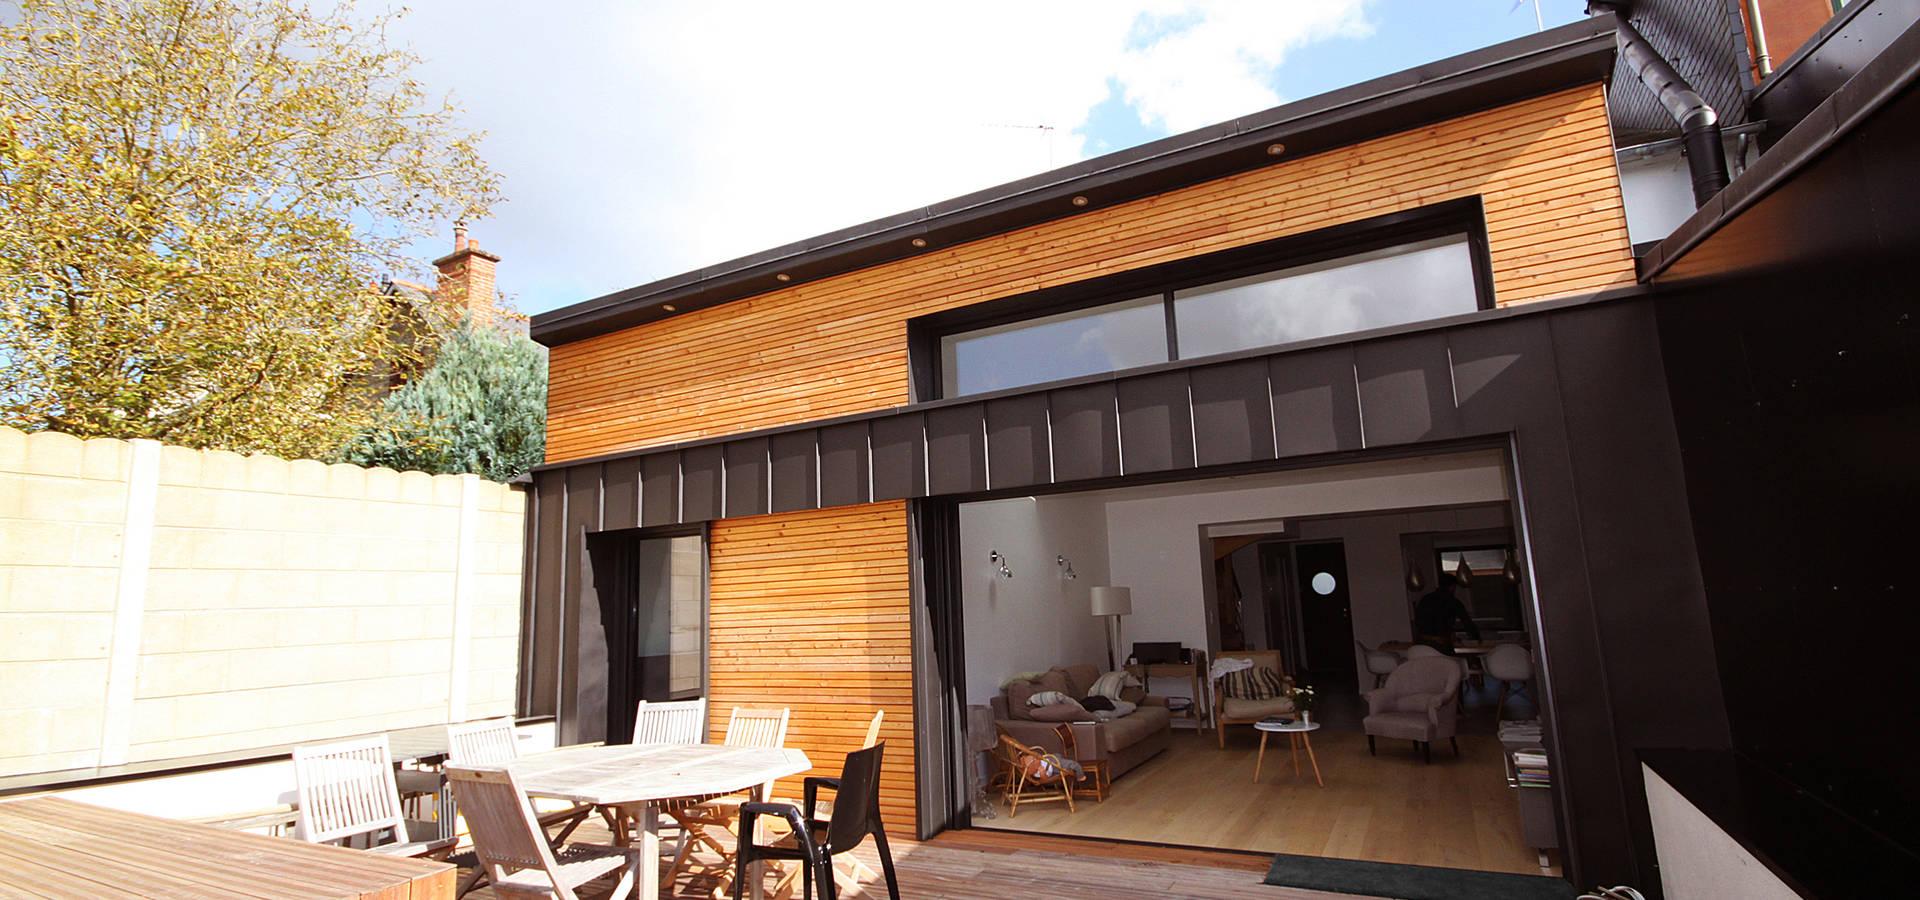 franck labbay architecte architectes carnac sur homify. Black Bedroom Furniture Sets. Home Design Ideas